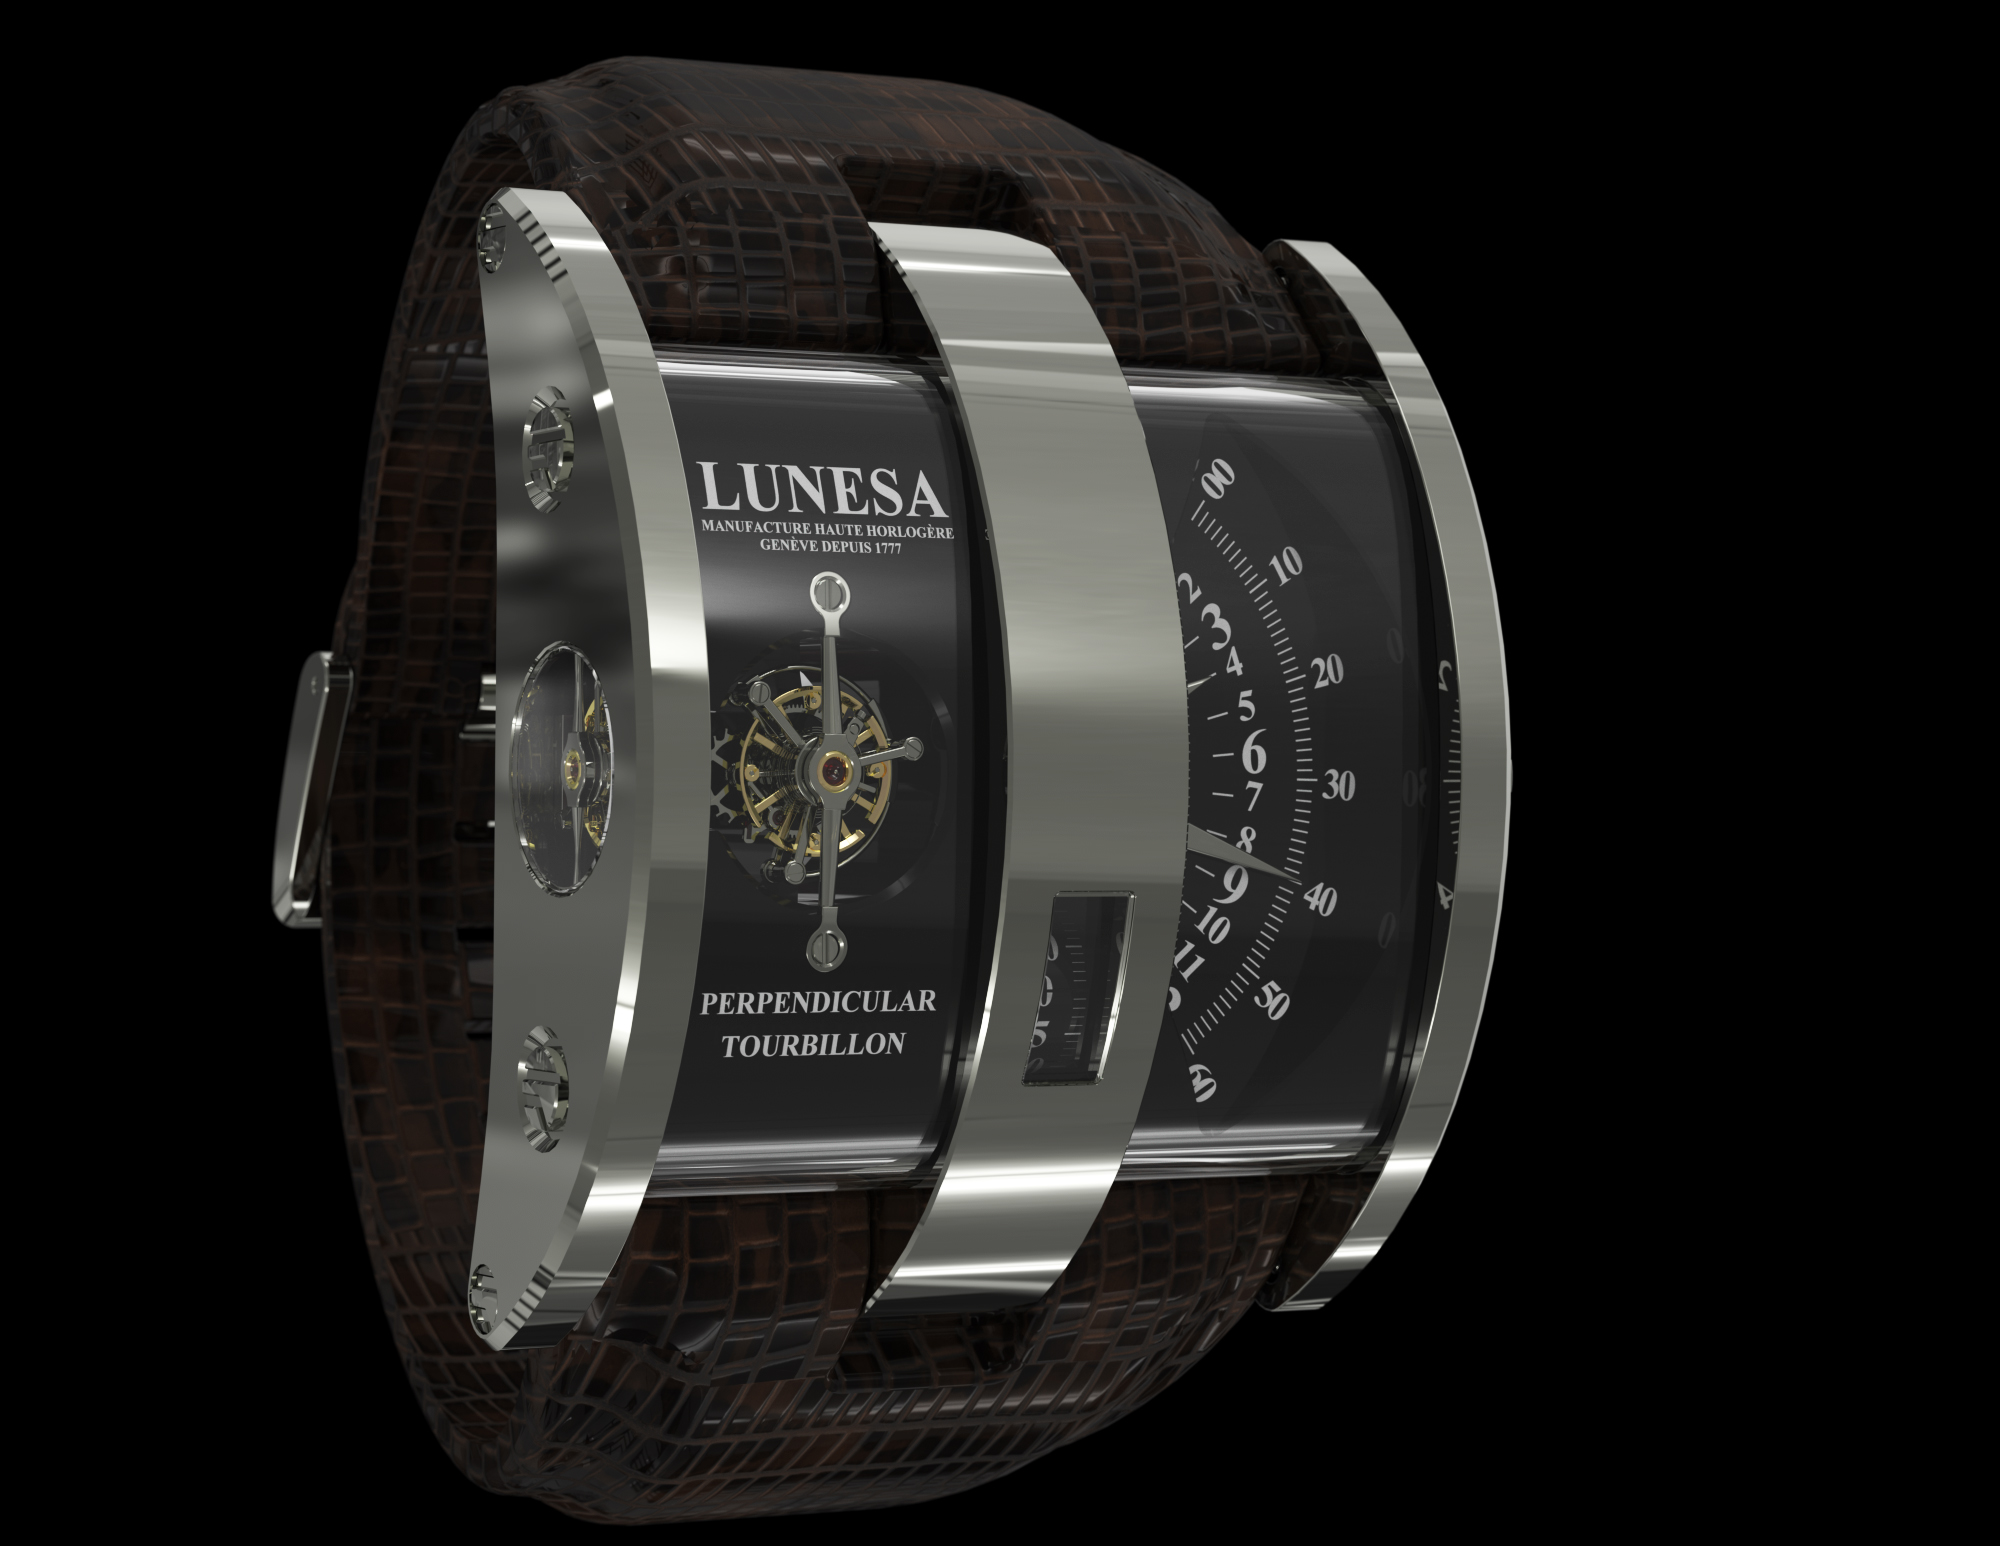 часы Lunesa  PERPENDICULAR TOURBILLON